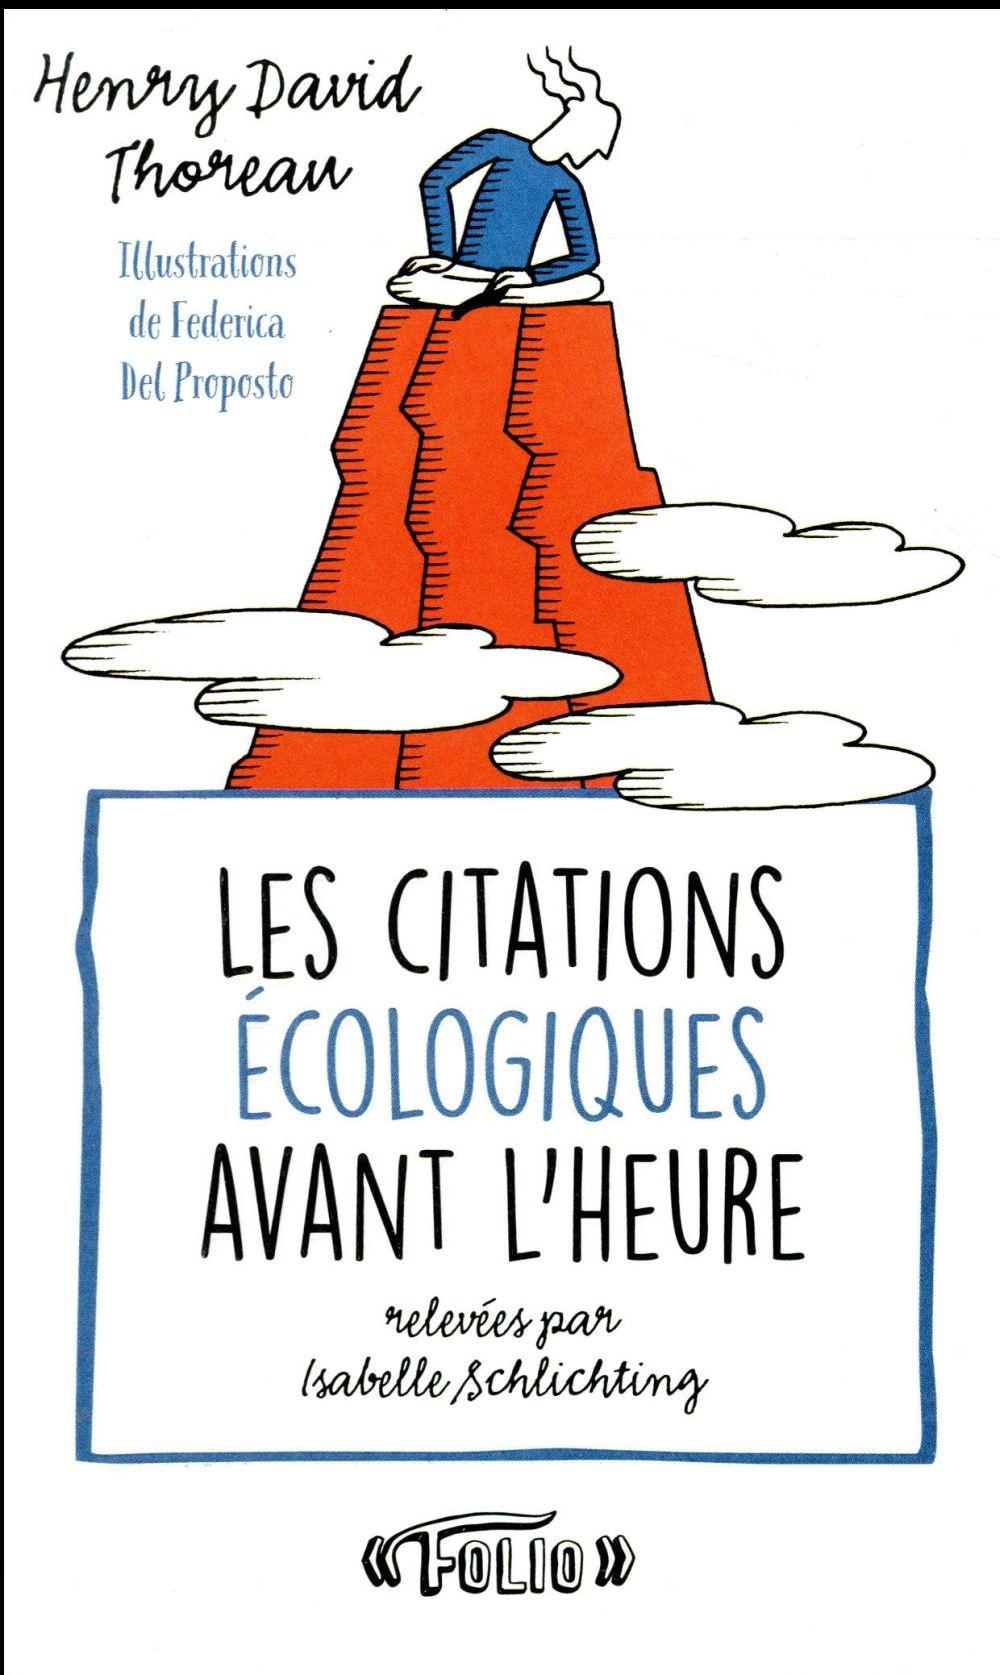 LES CITATIONS ECOLOGIQUES AVANT L'HEURE